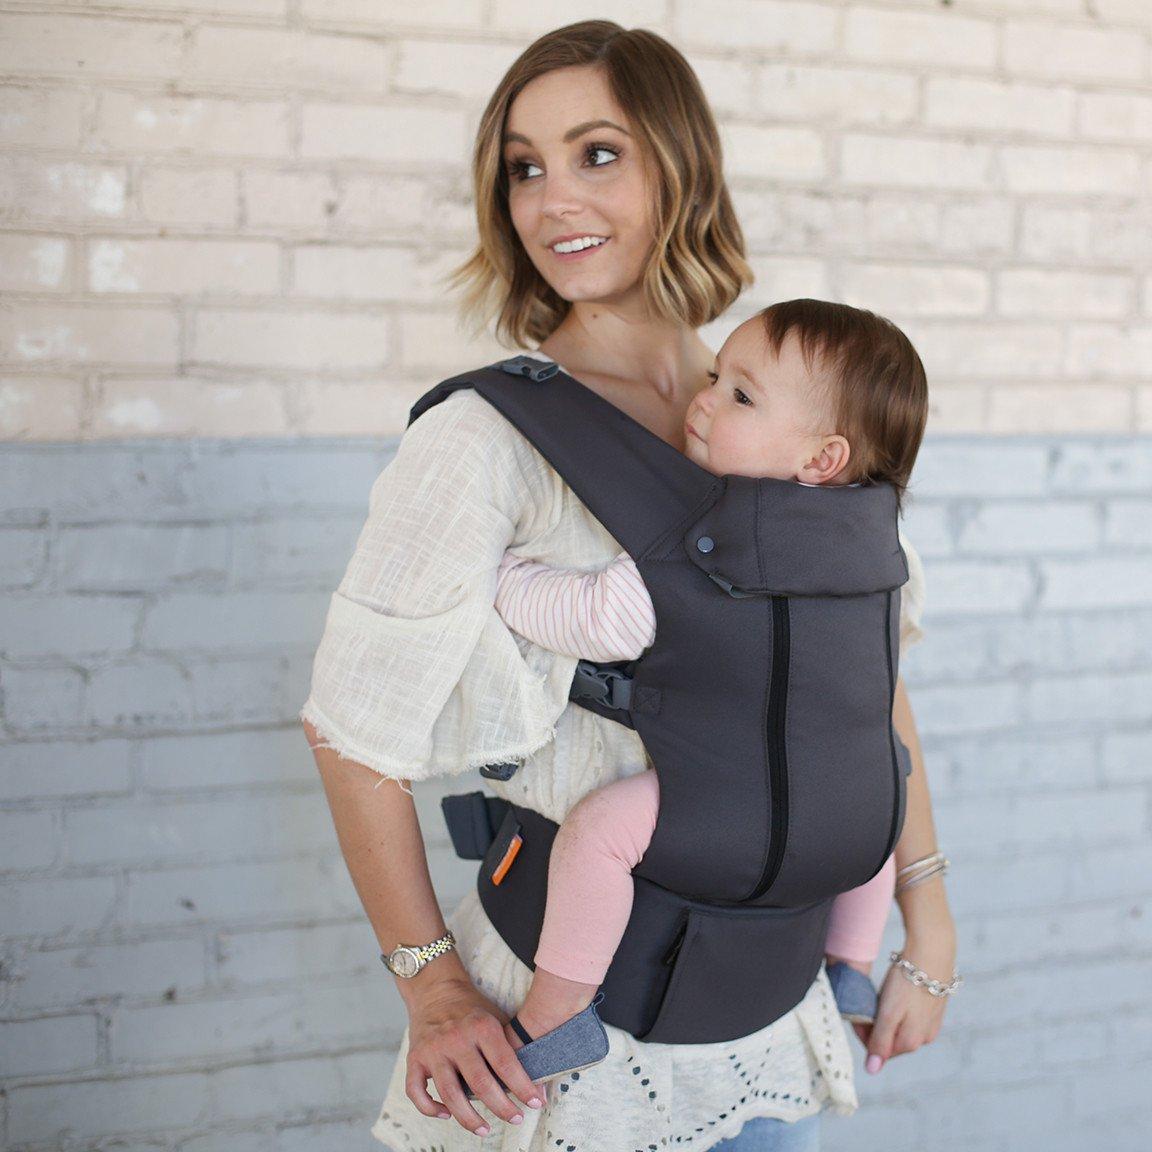 Beco-8 Baby Carrier Bauchtrage mit geschlossenem Rückenpanel